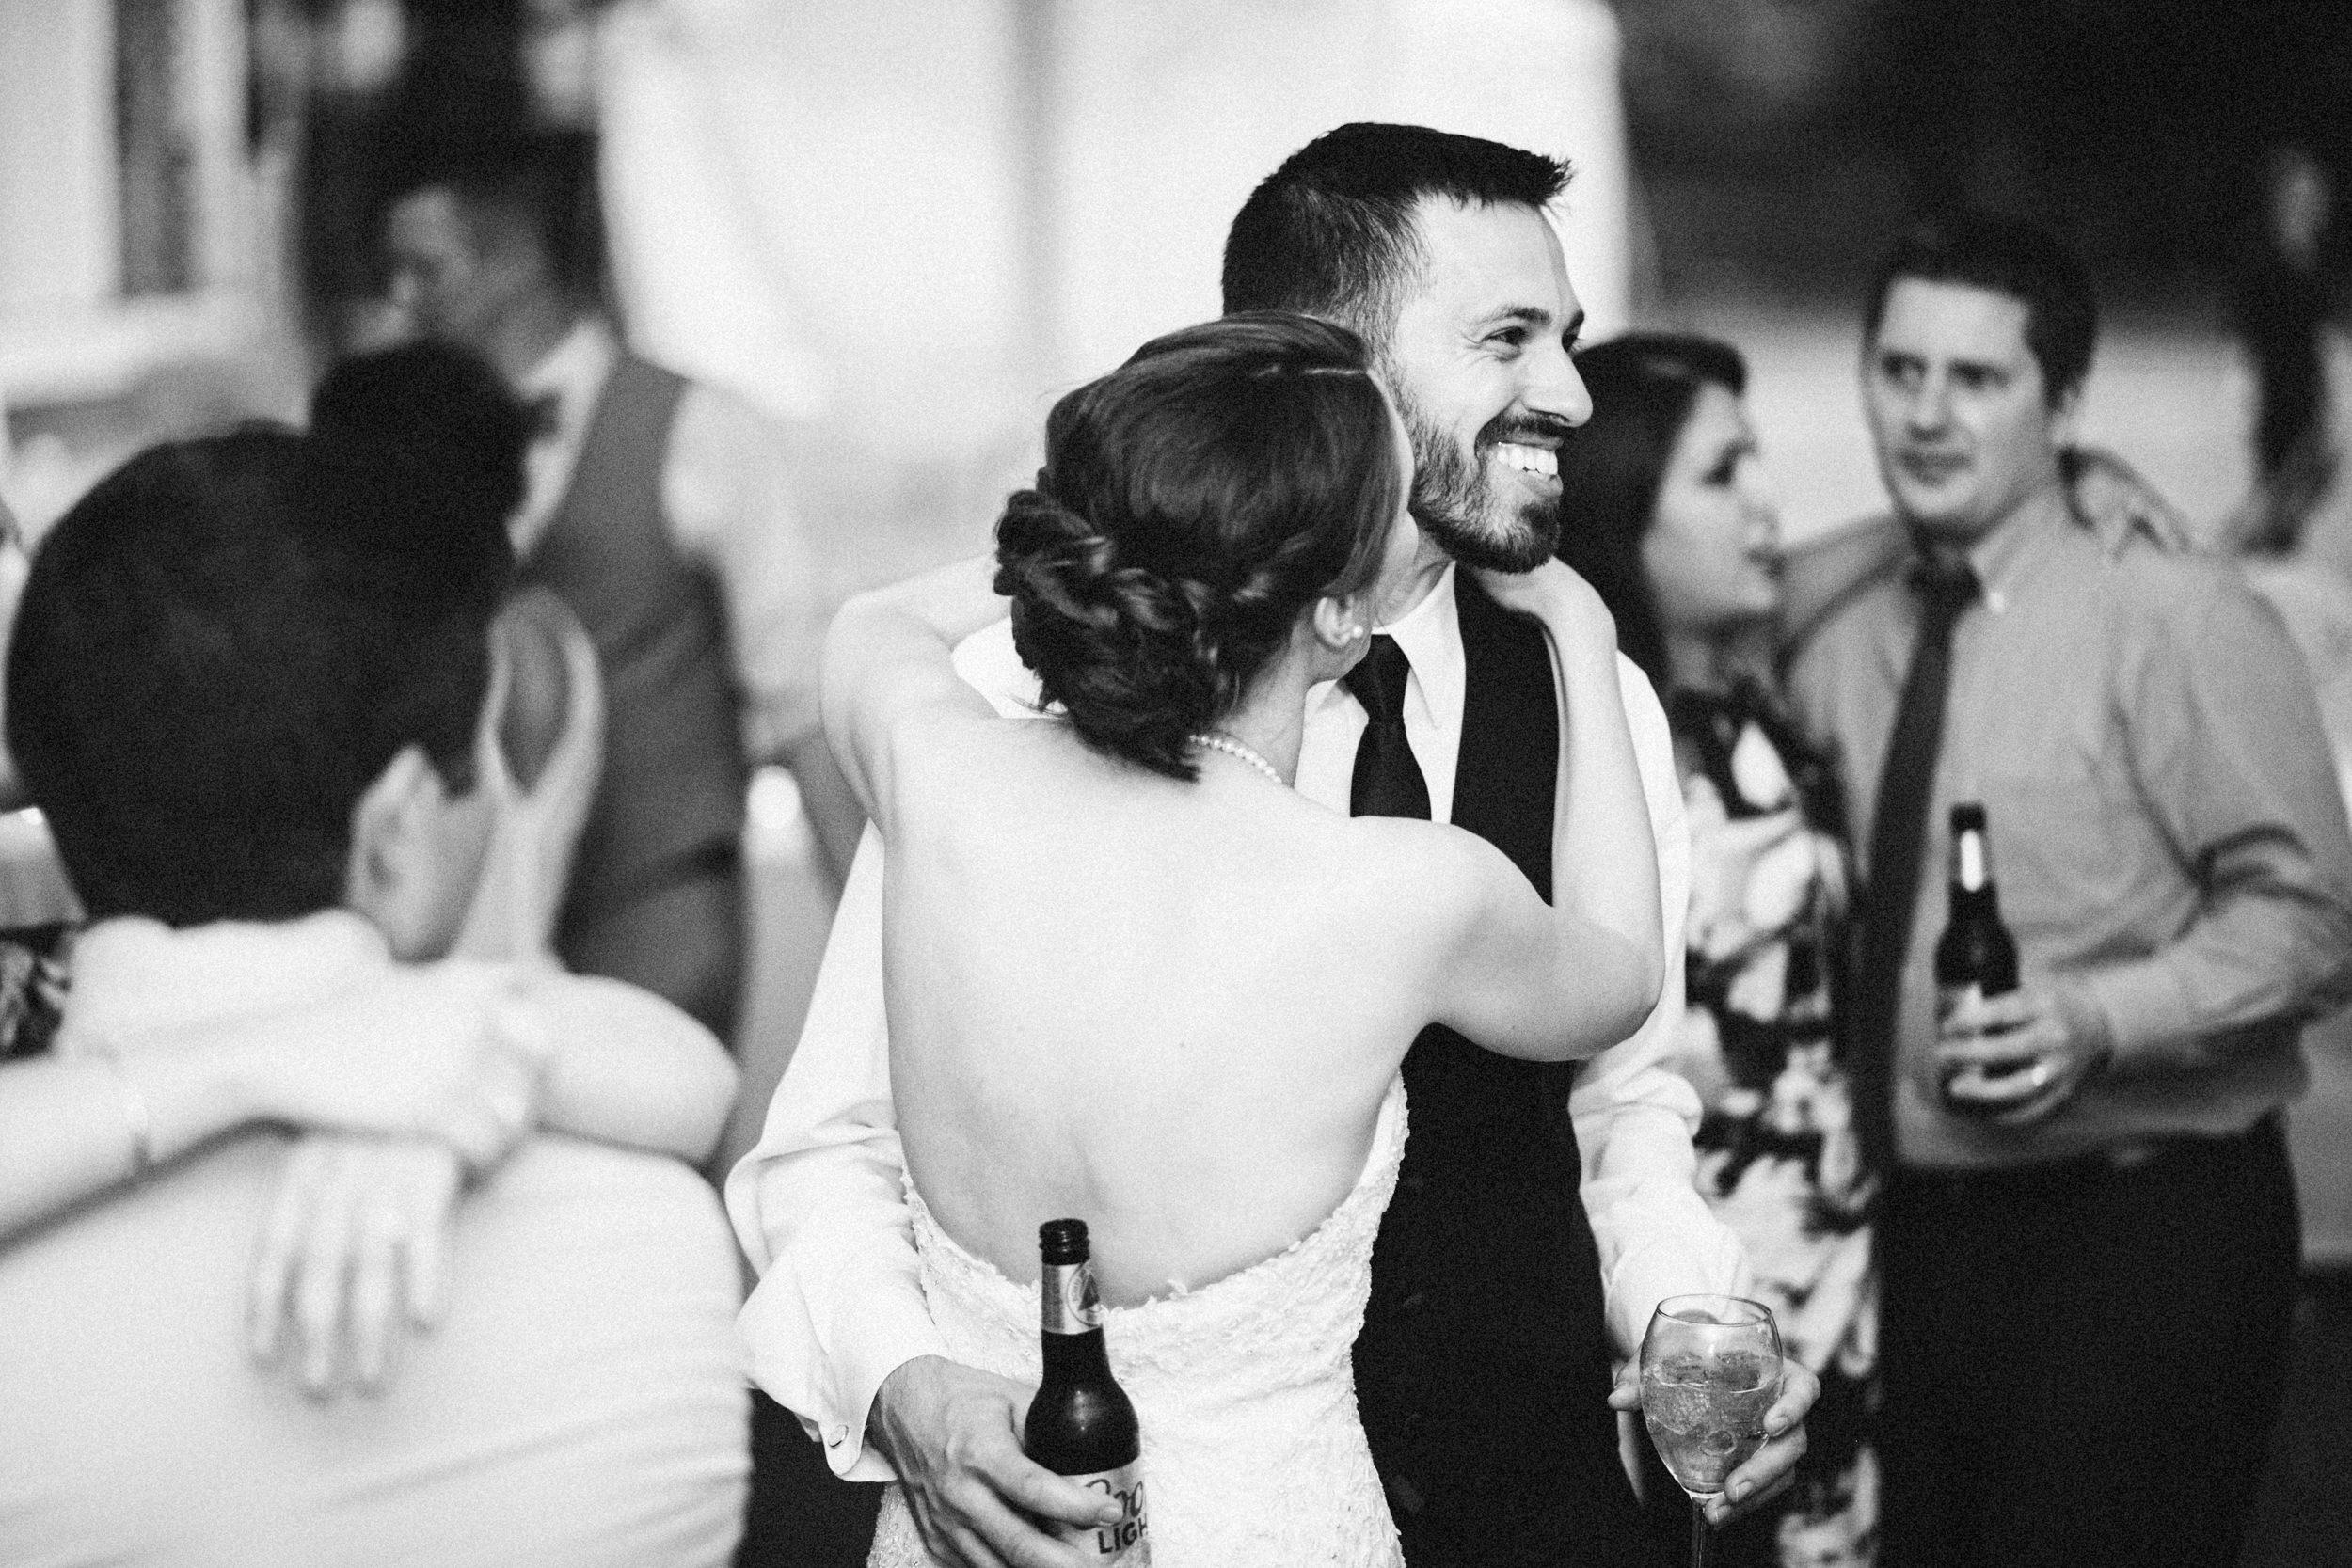 Louisville-Kentucky-Wedding-Elopement-Photographer-Sarah-Katherine-Davis-Photography-Whitehall-Classic-Timeless-Garden-Wedding-815.jpg